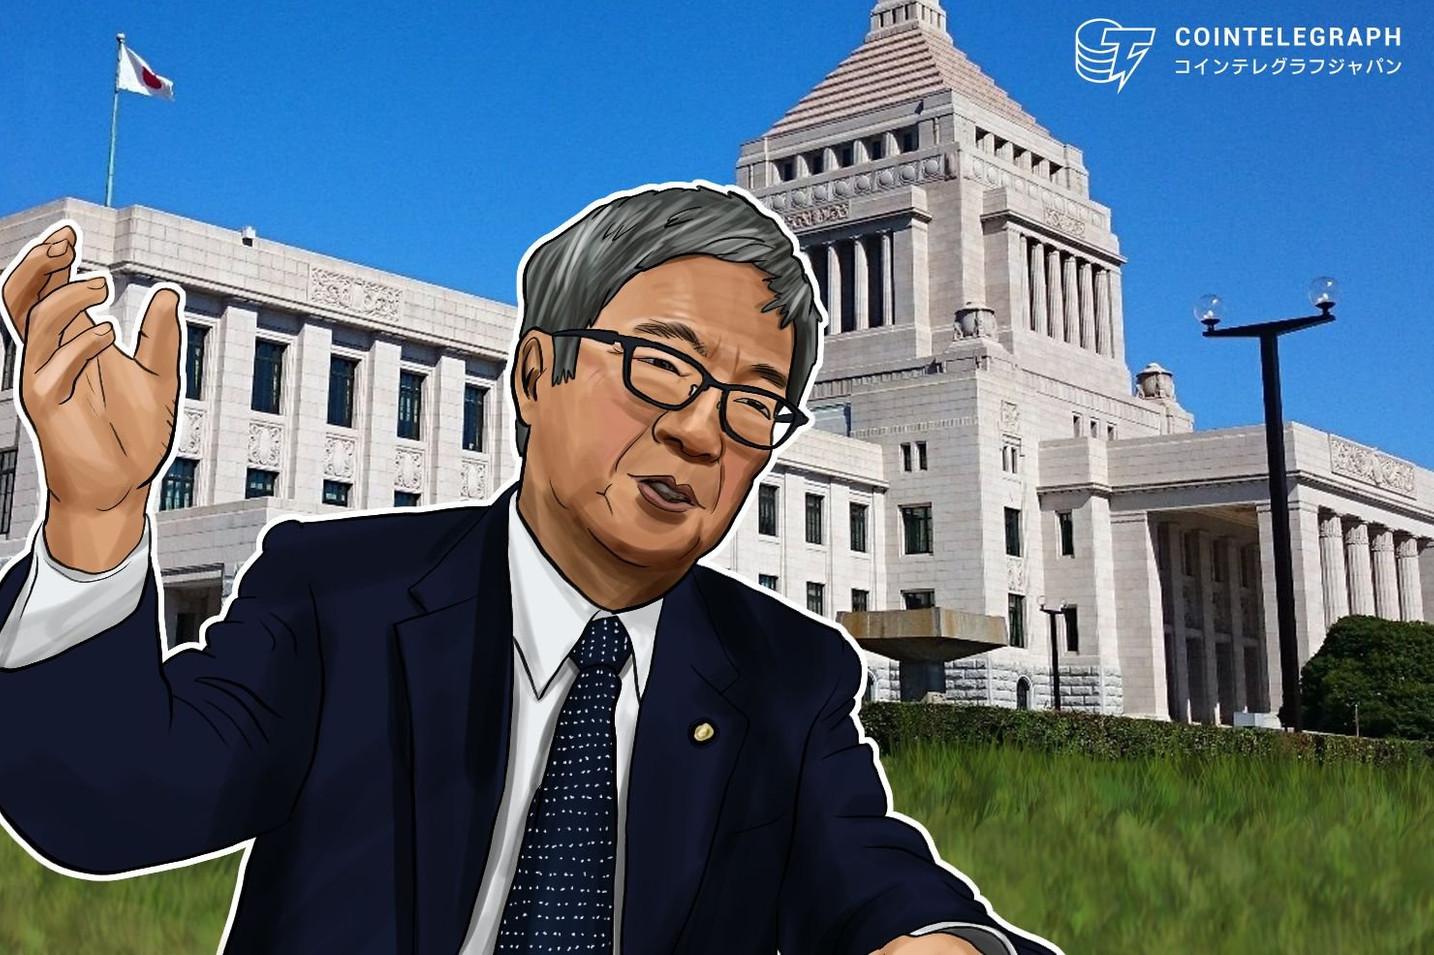 藤巻議員、仮想通貨税制改正の嘆願書を国会に提出